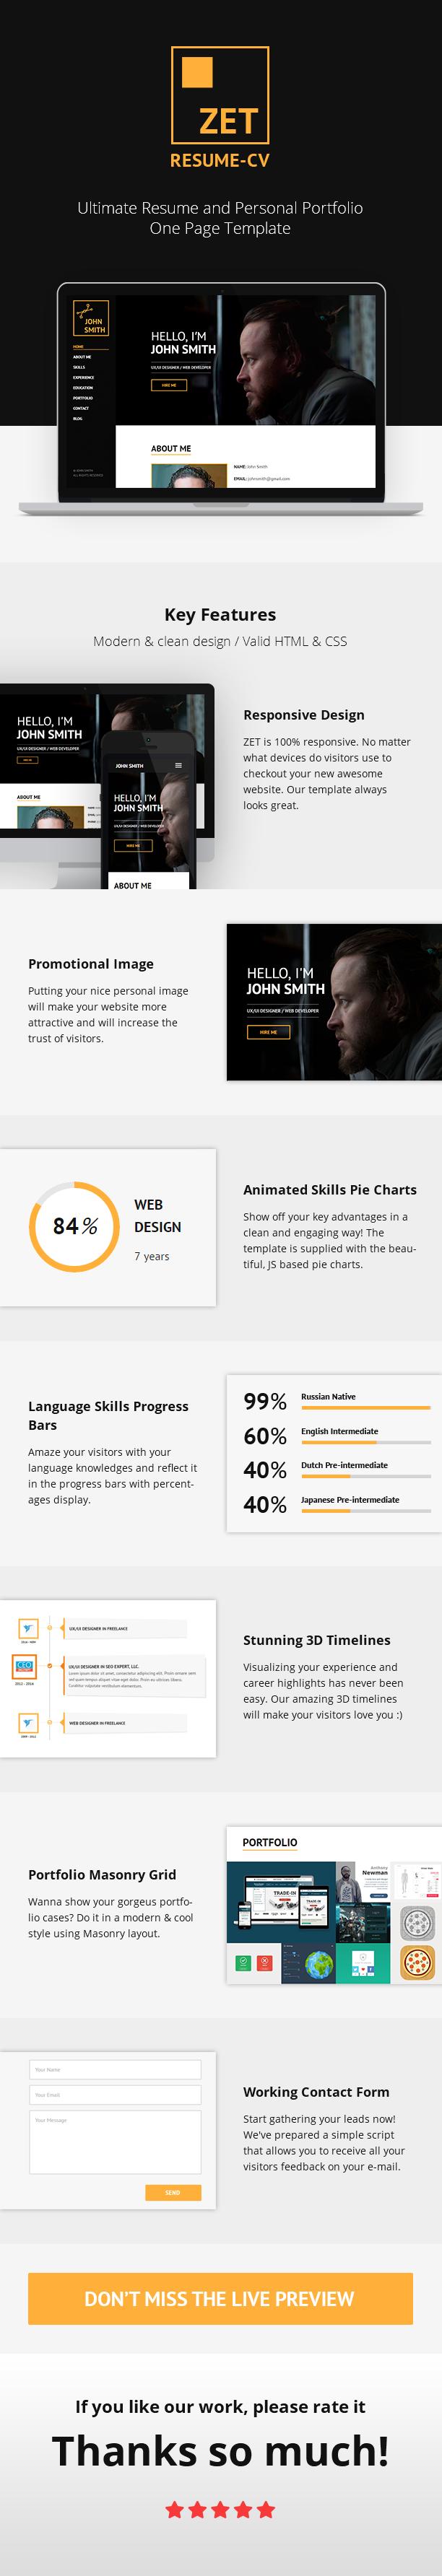 ZET - One Page Resume/Persönliches Portfolio WordPress Theme - 1